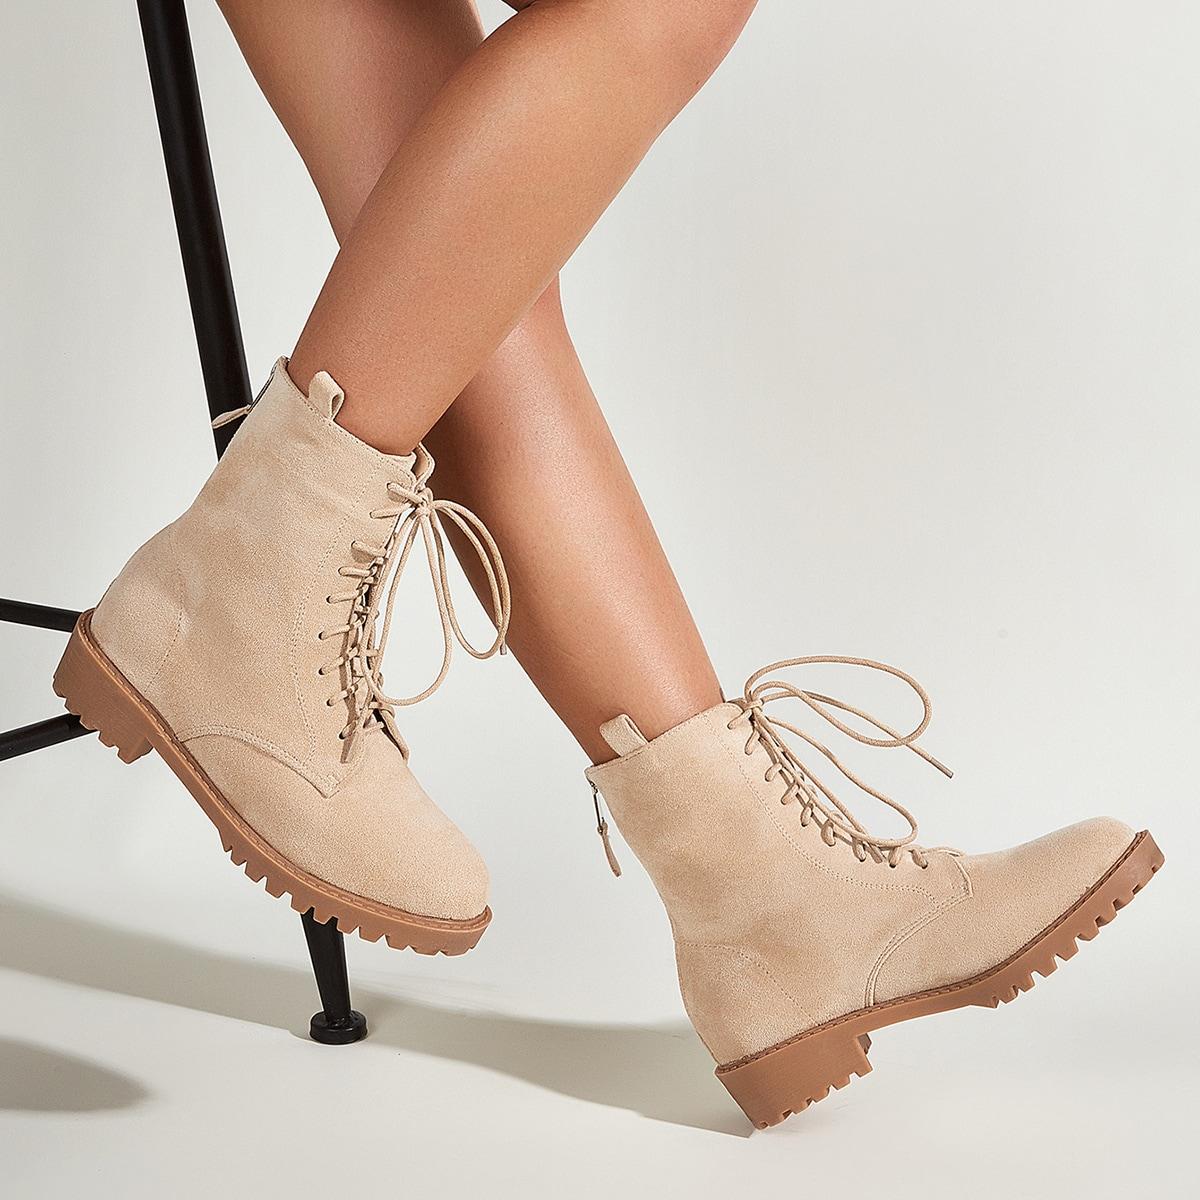 Замшевые сапоги на шнурках от SHEIN